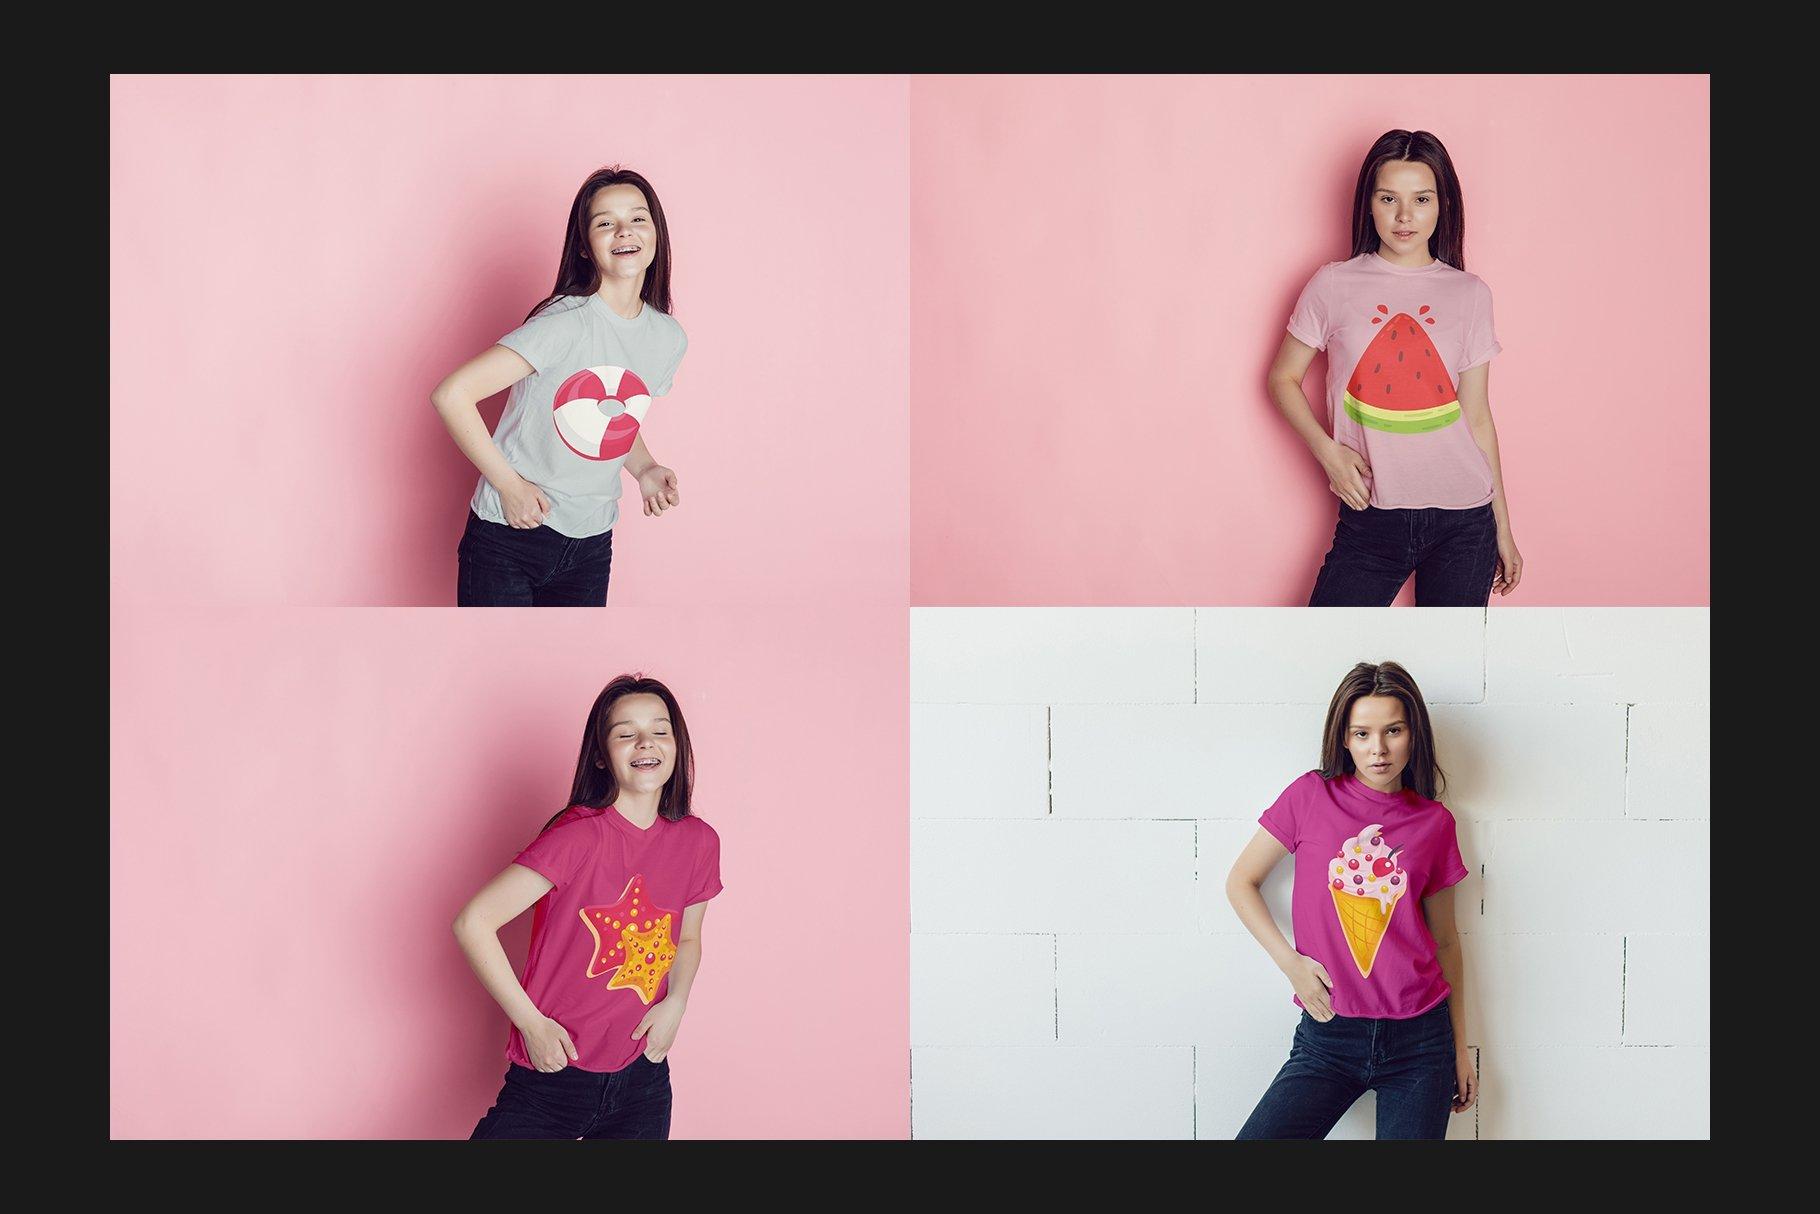 青少年T恤半袖衫印花图案设计展示样机合集 Teenager T-Shirt Mockup Set插图(7)